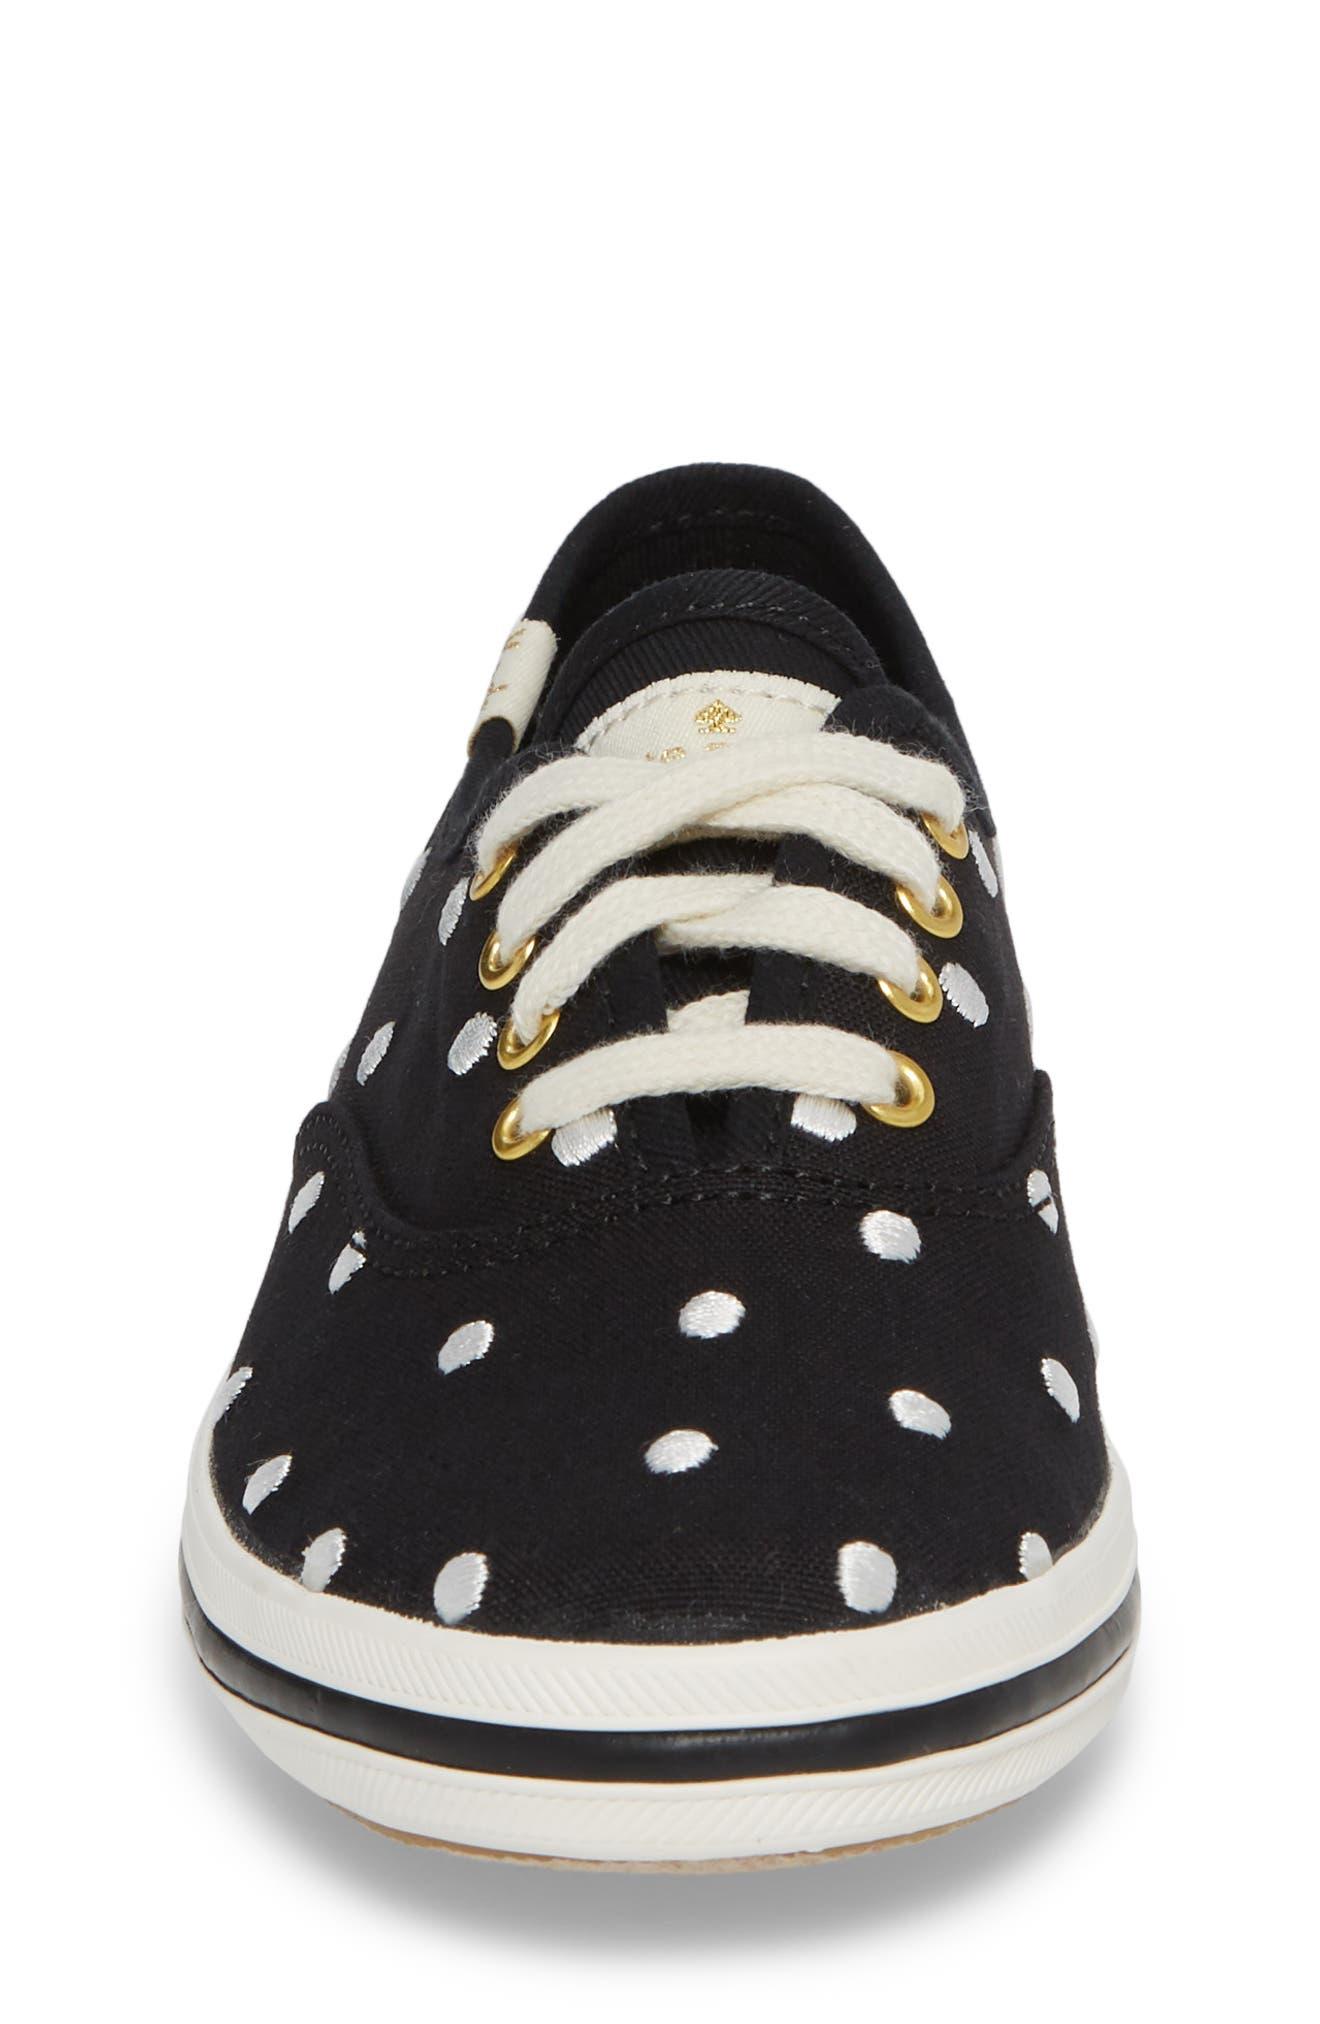 x kate spade new york champion polka dot lace-up shoe,                             Alternate thumbnail 4, color,                             BLACK DANCING DOT